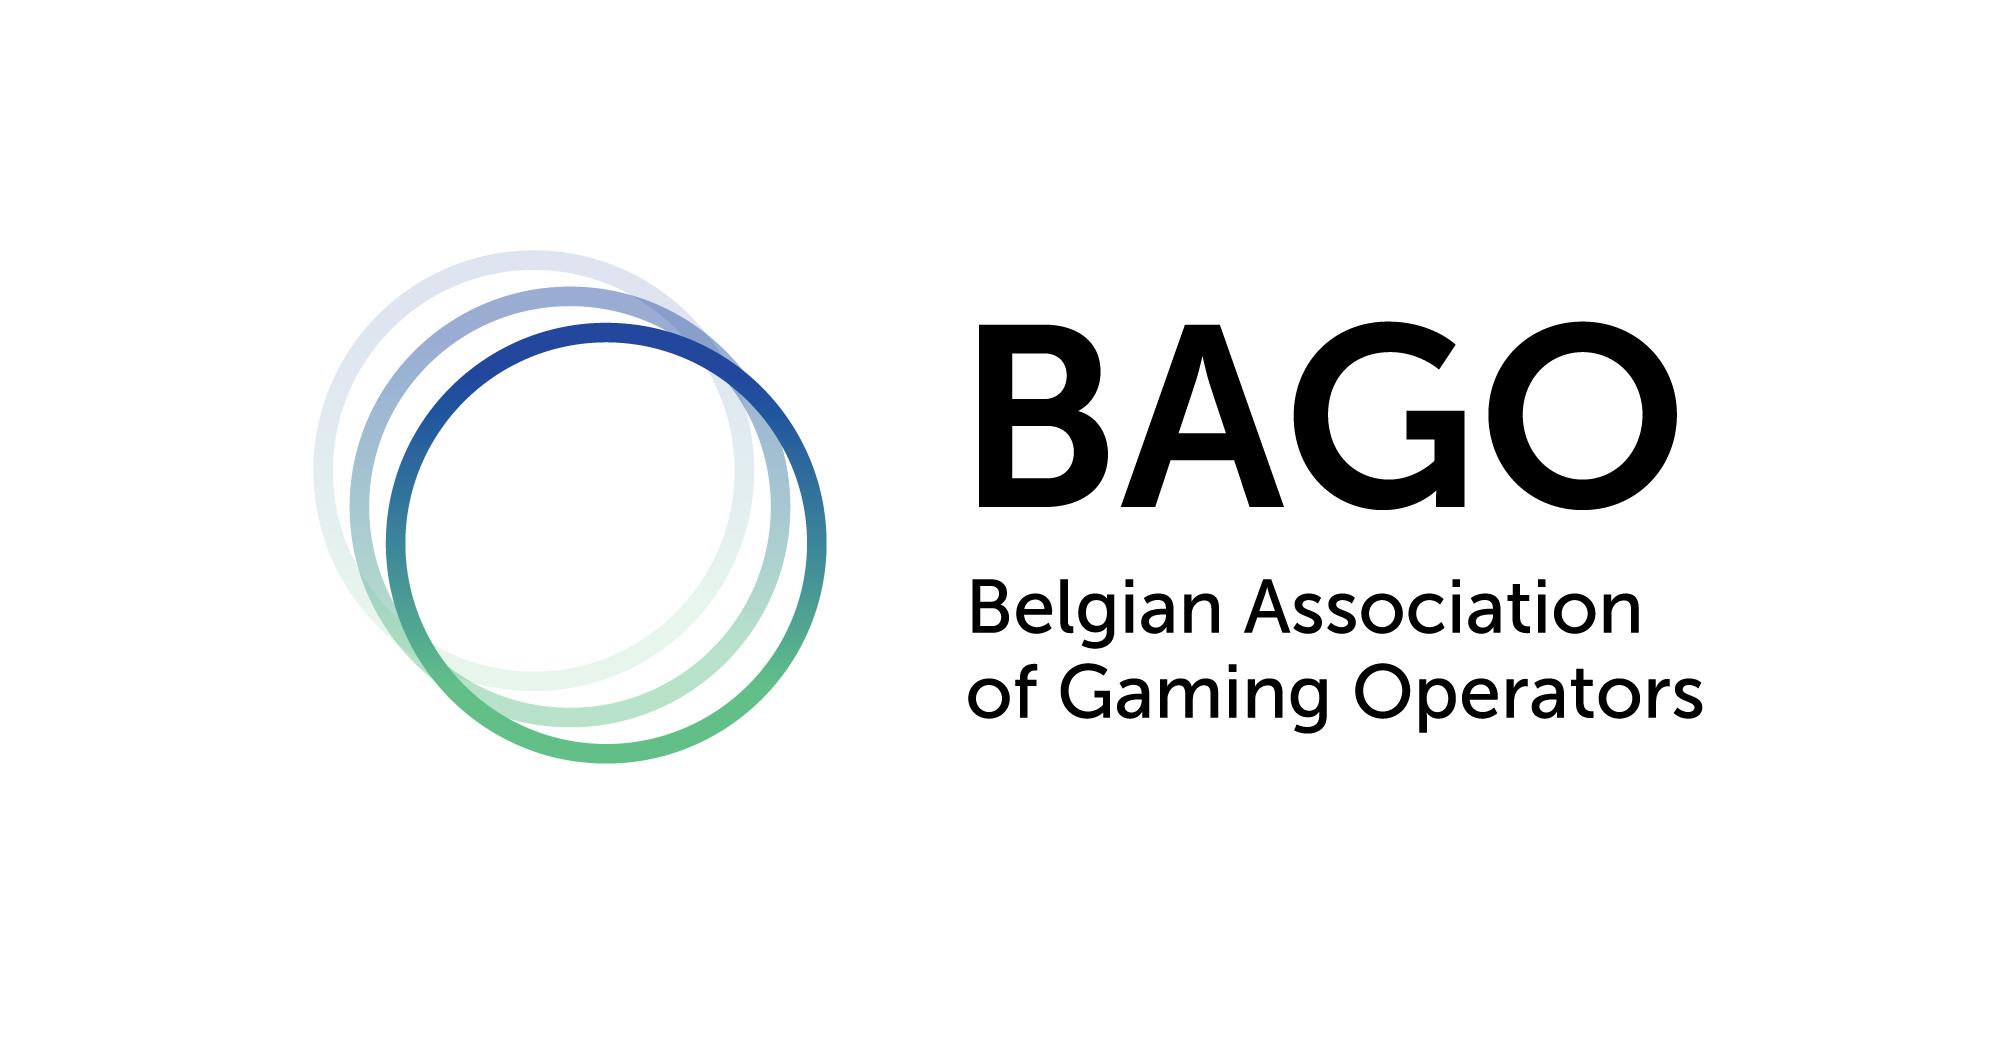 Vereniging van private kansspeloperatoren - Association belge des opérateurs de jeux de hasard